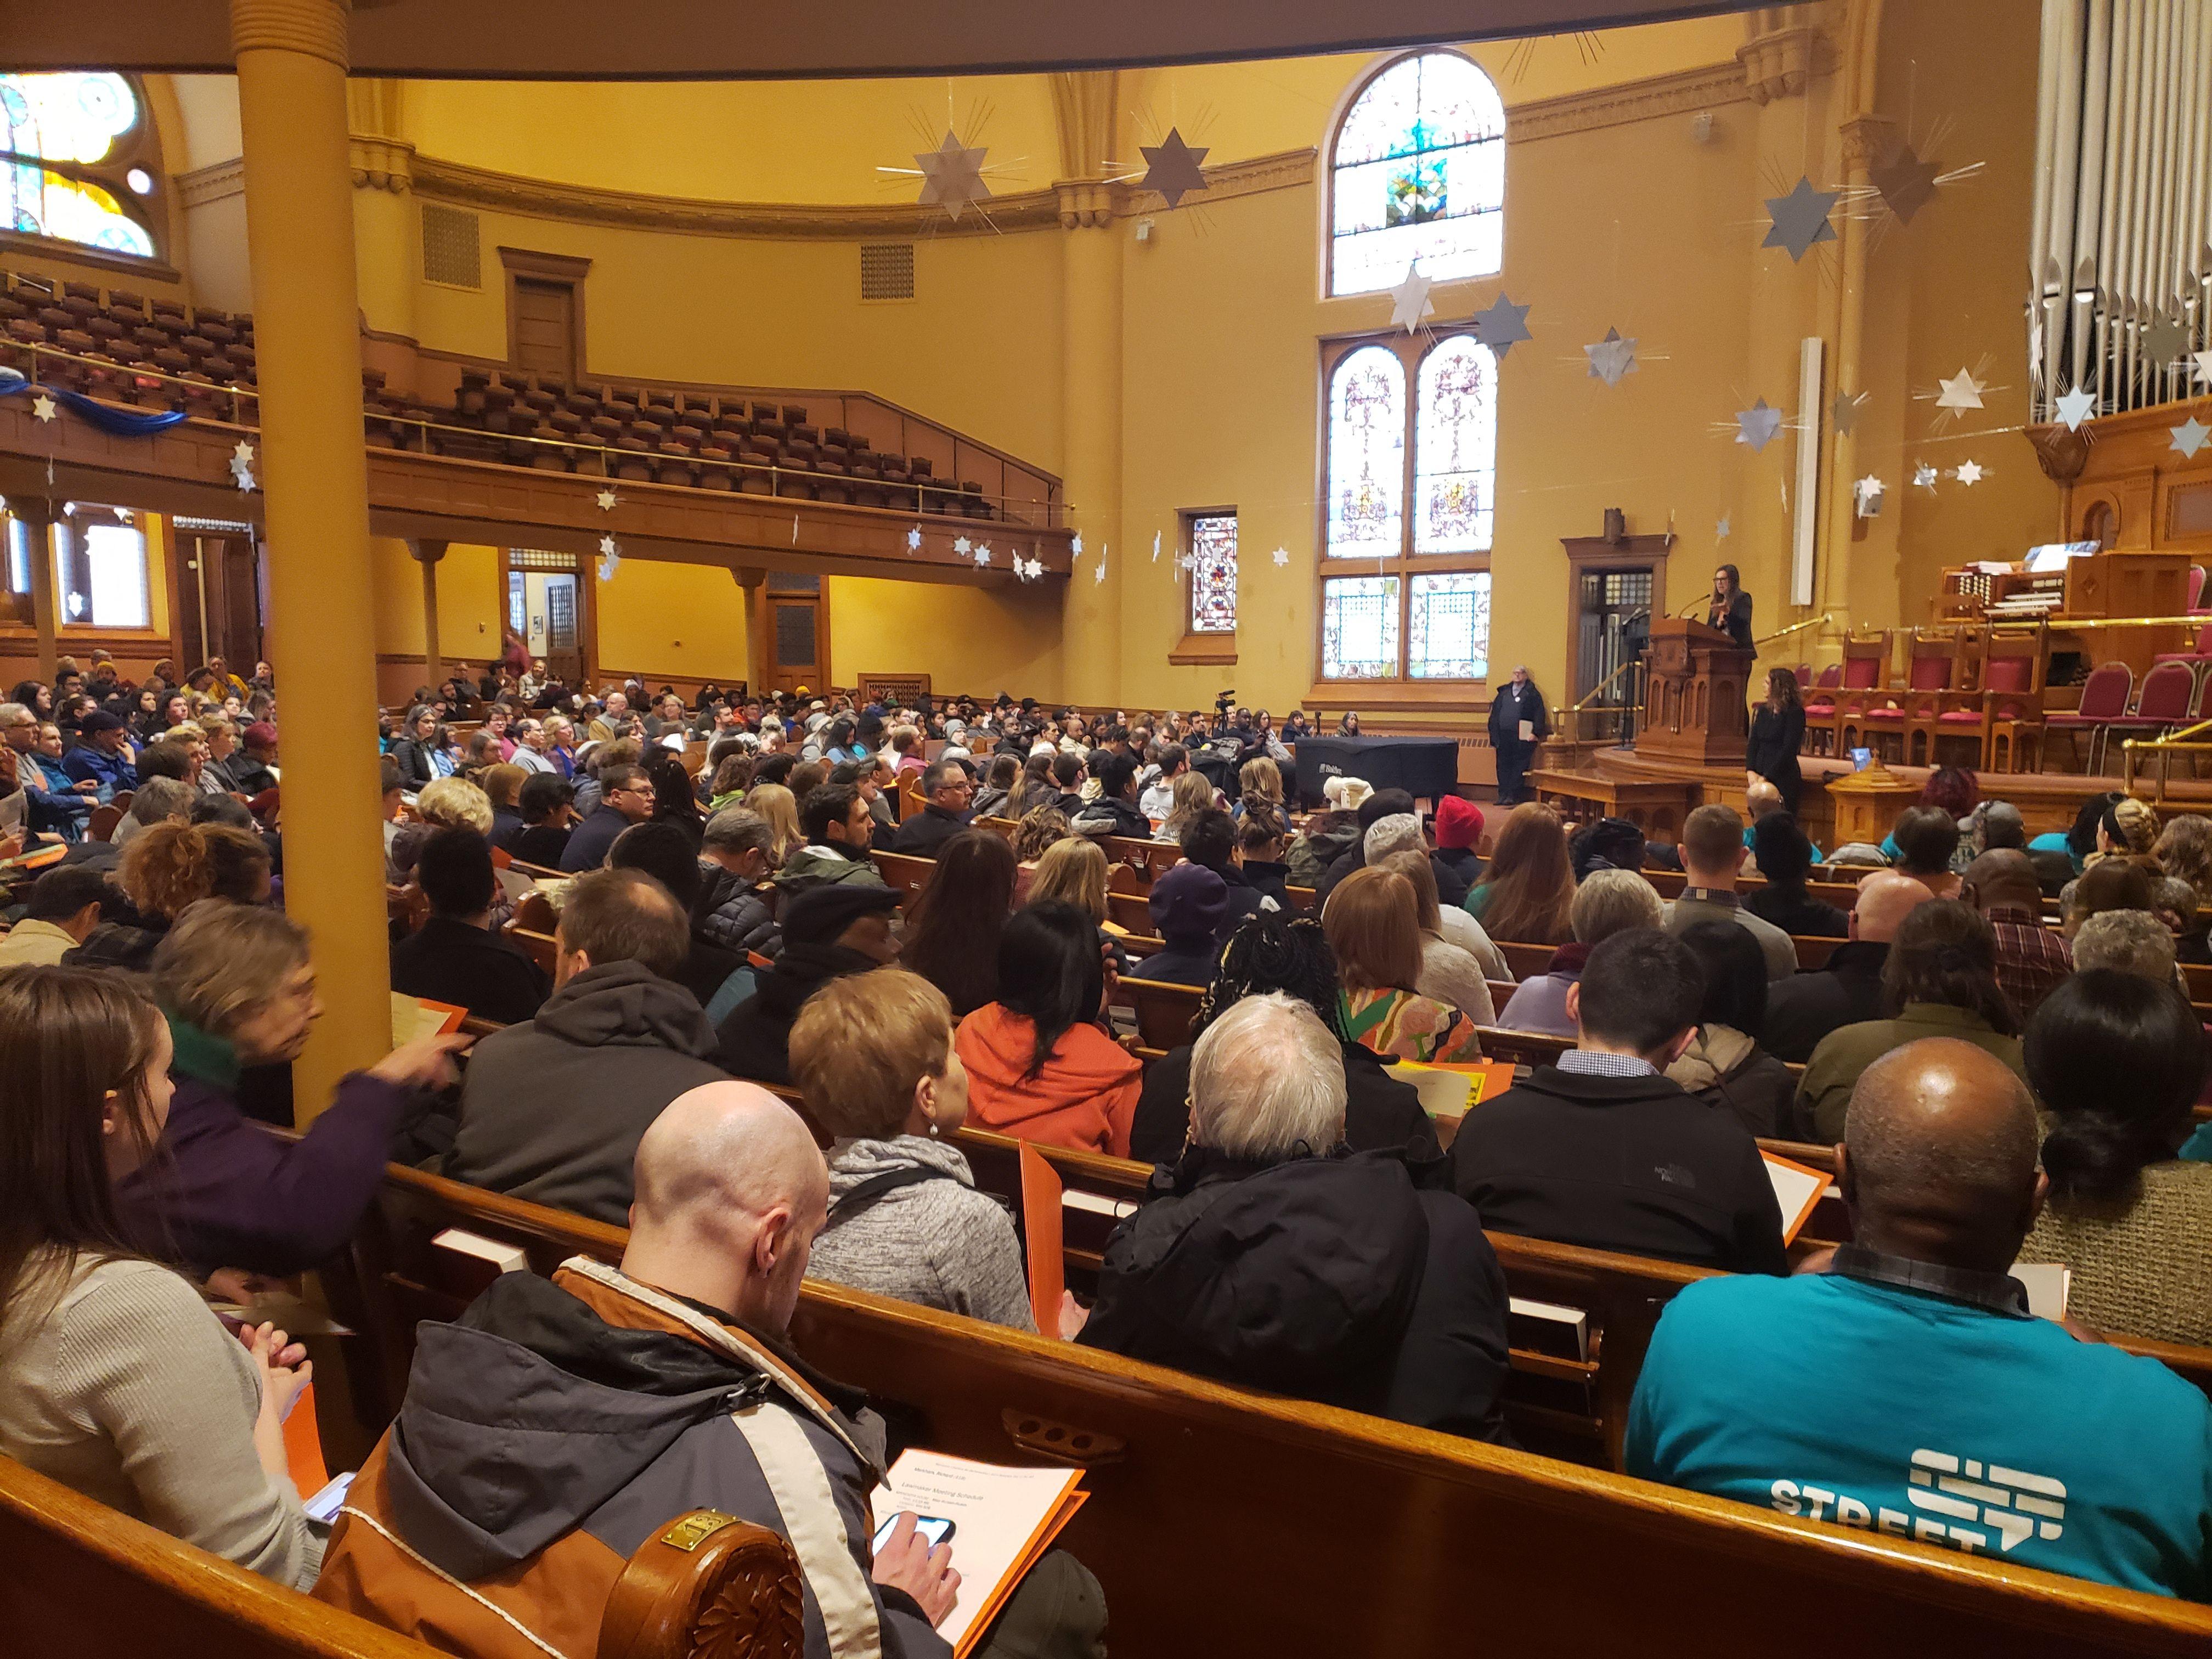 The crowd at Central Presbyterian Church